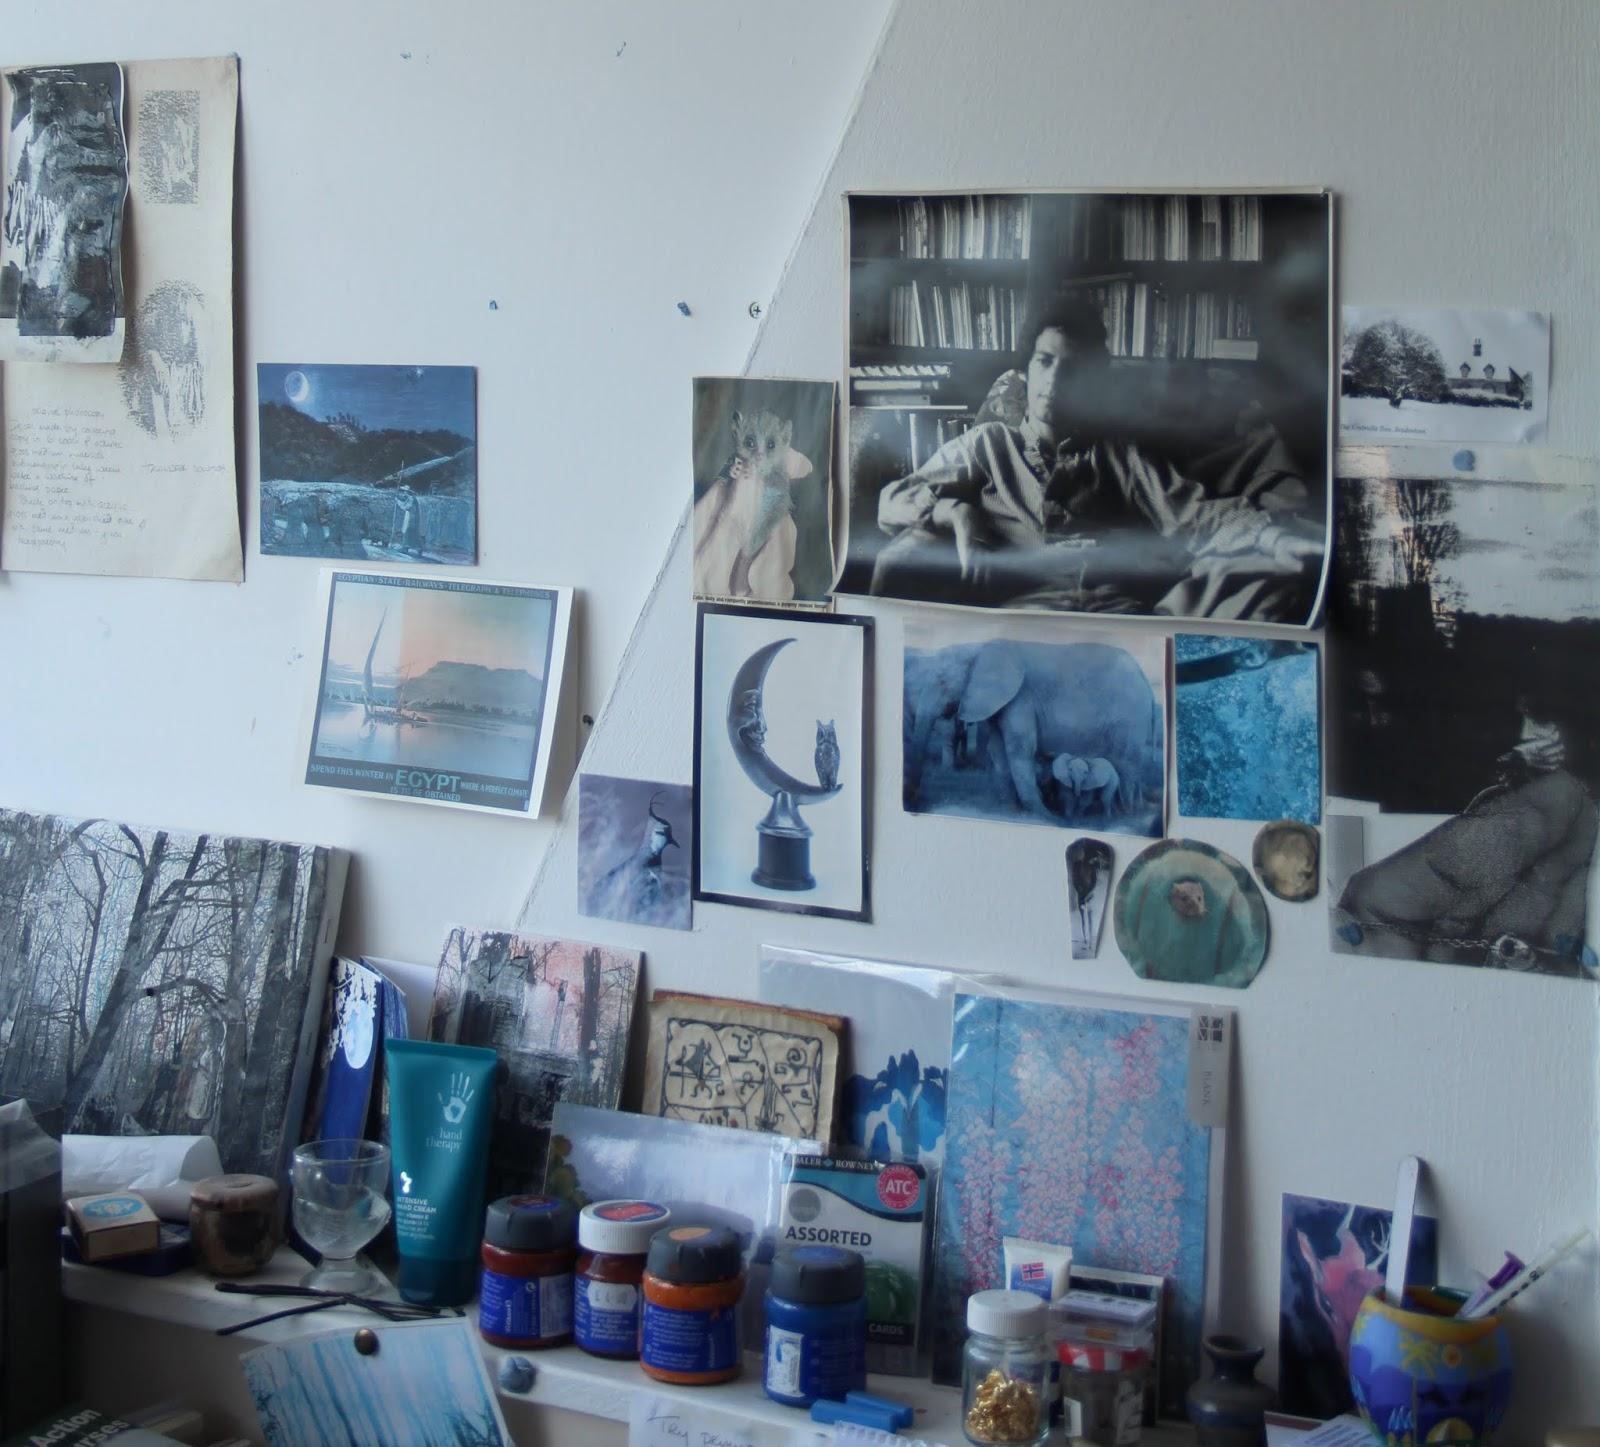 patricia lynch artist, commercial square studios, trend daily blog, caroline davis